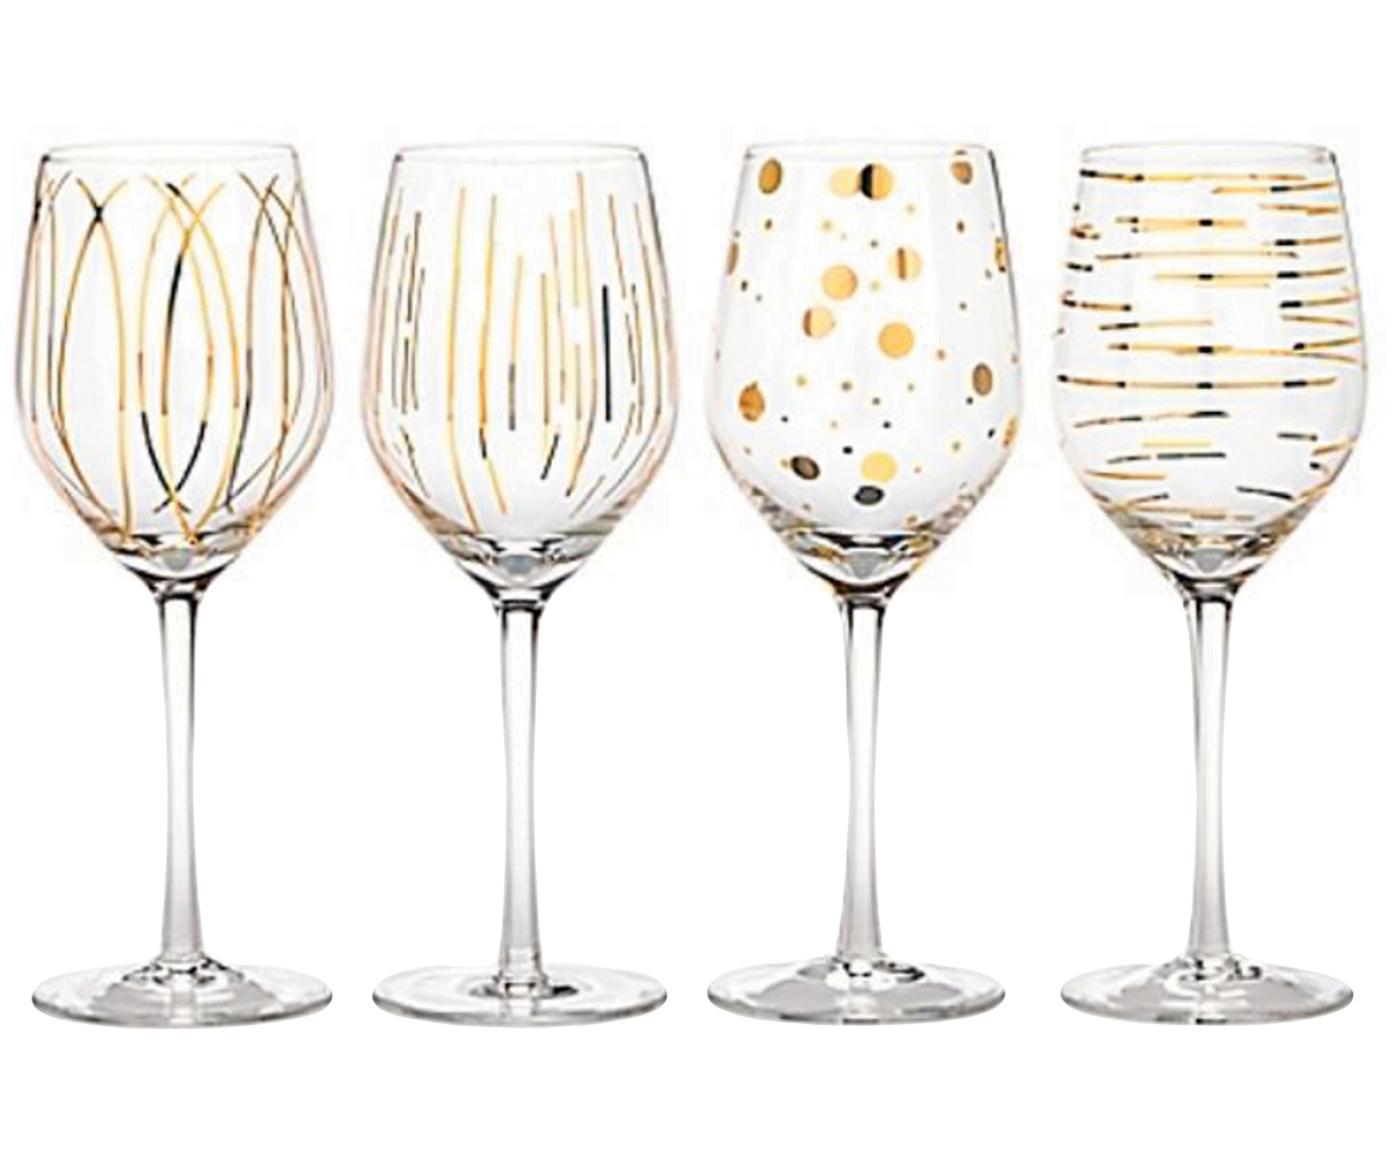 Copas de vino blanco Mikasa Cheers, 4uds., Vidrio, Transparente, dorado, Ø 9x Al 25 cm